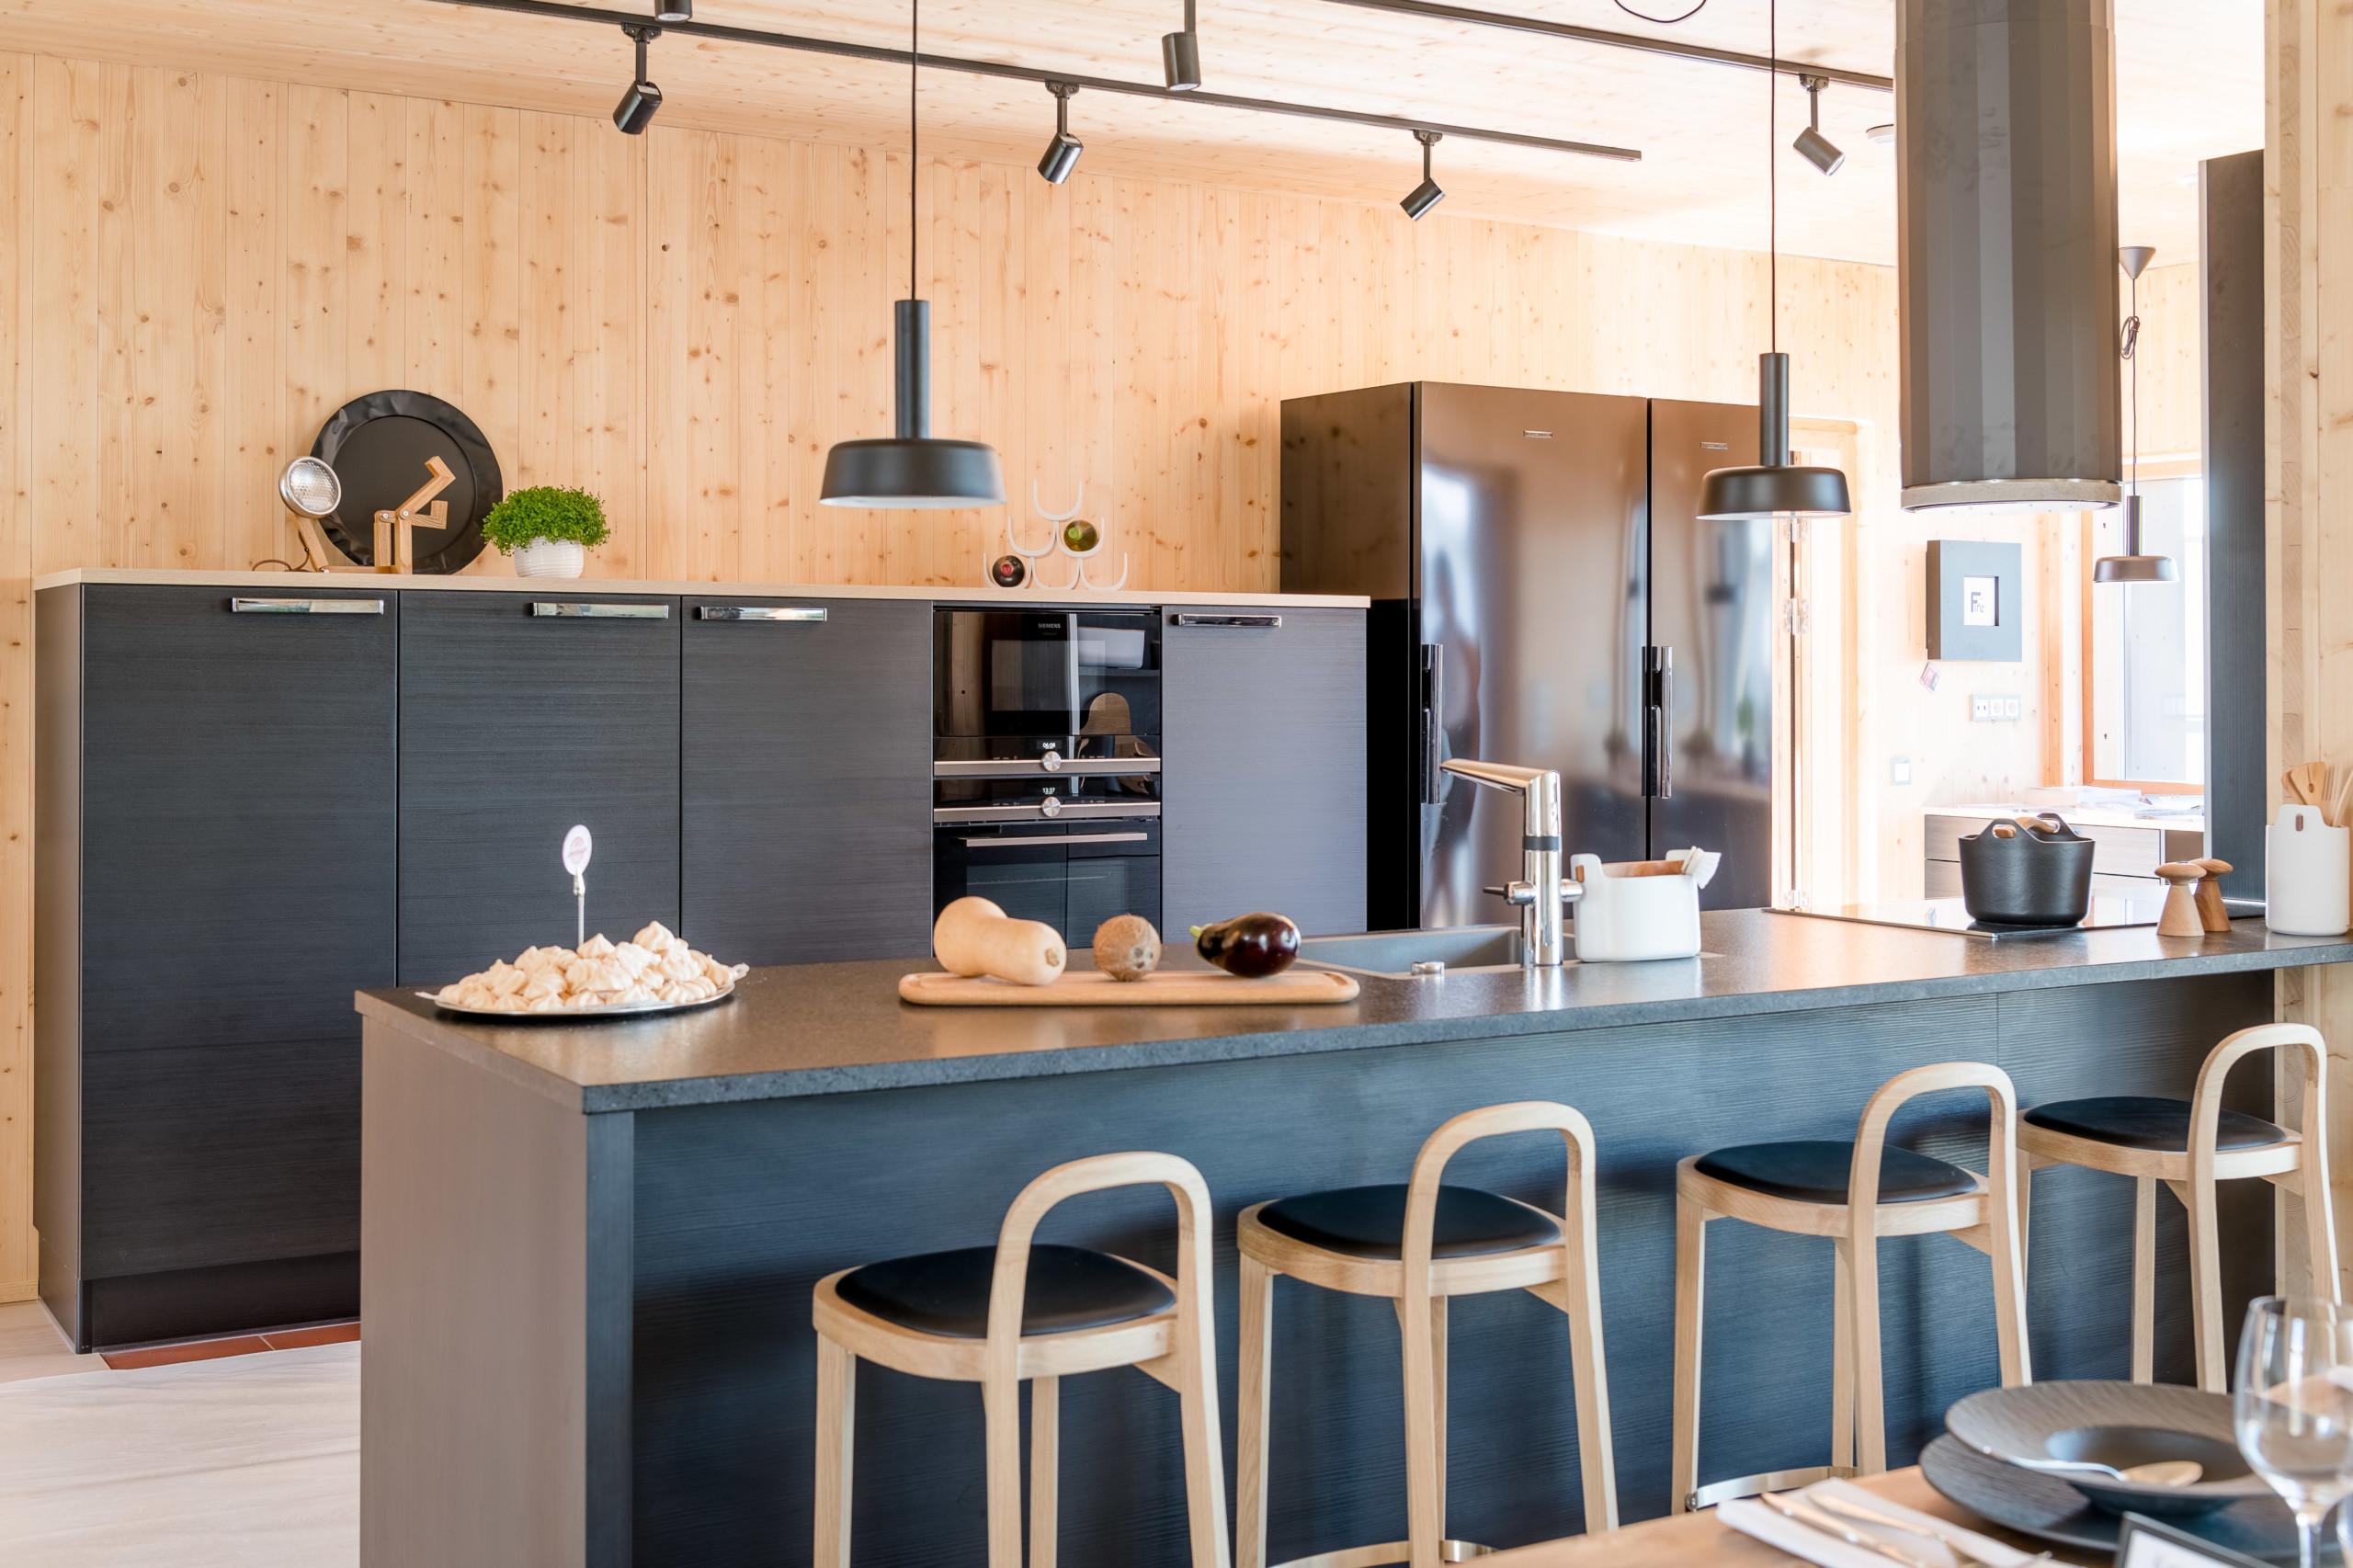 keittiö talo haltiatar